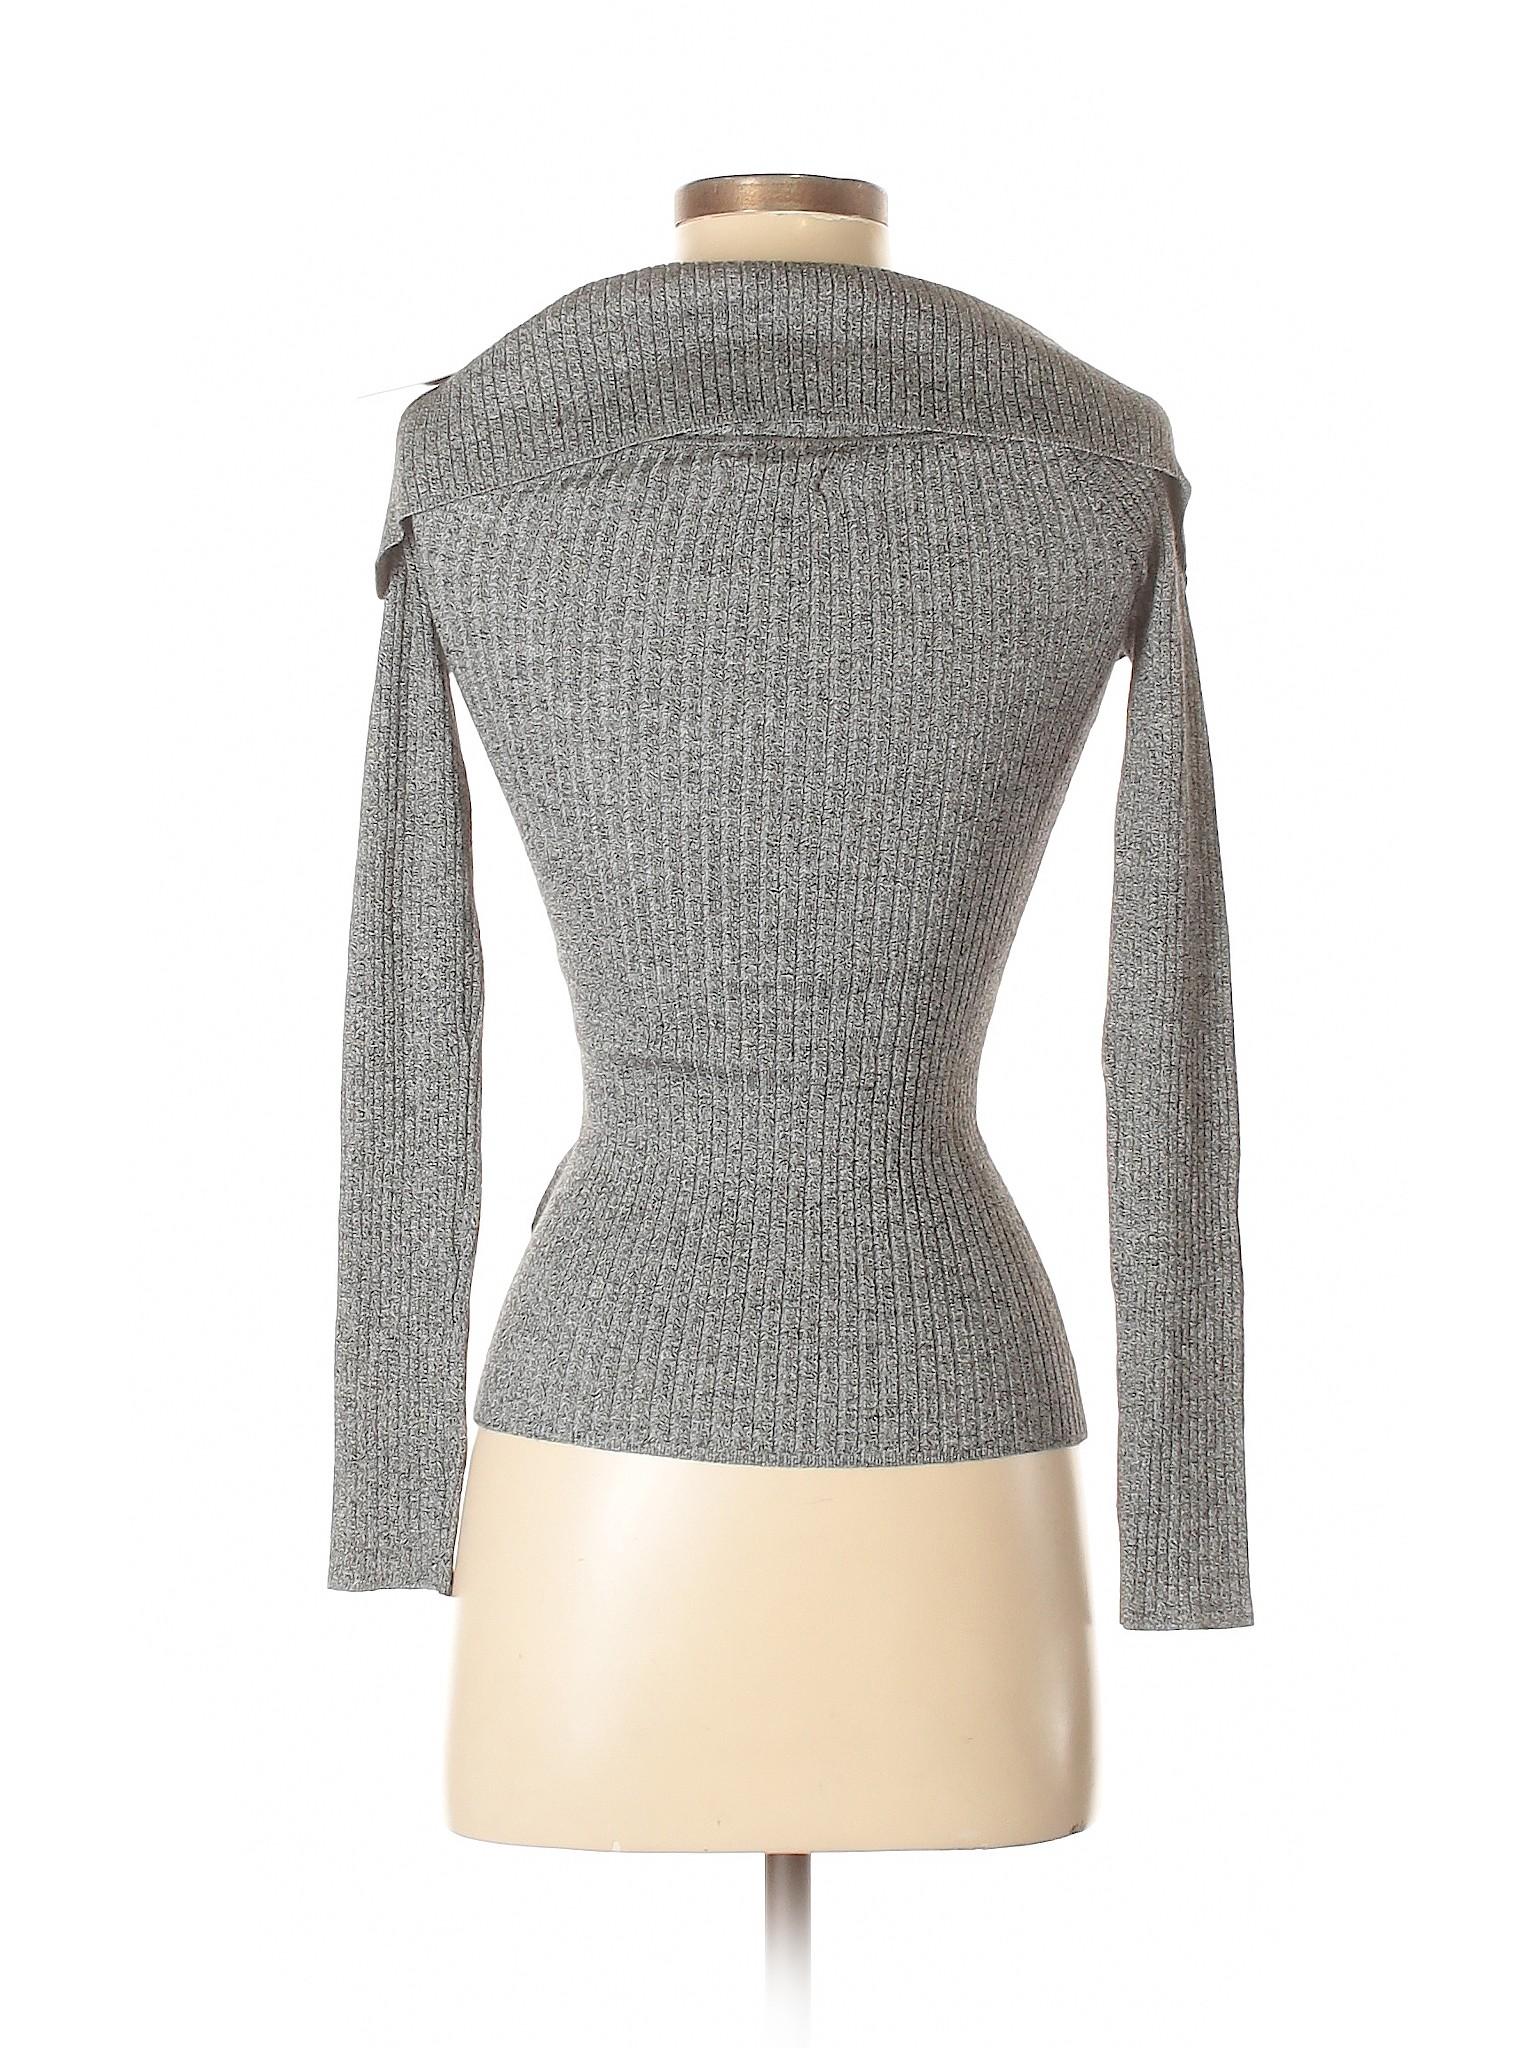 Sweater Boutique winter Lopez Jennifer Pullover IqAIwFHTx